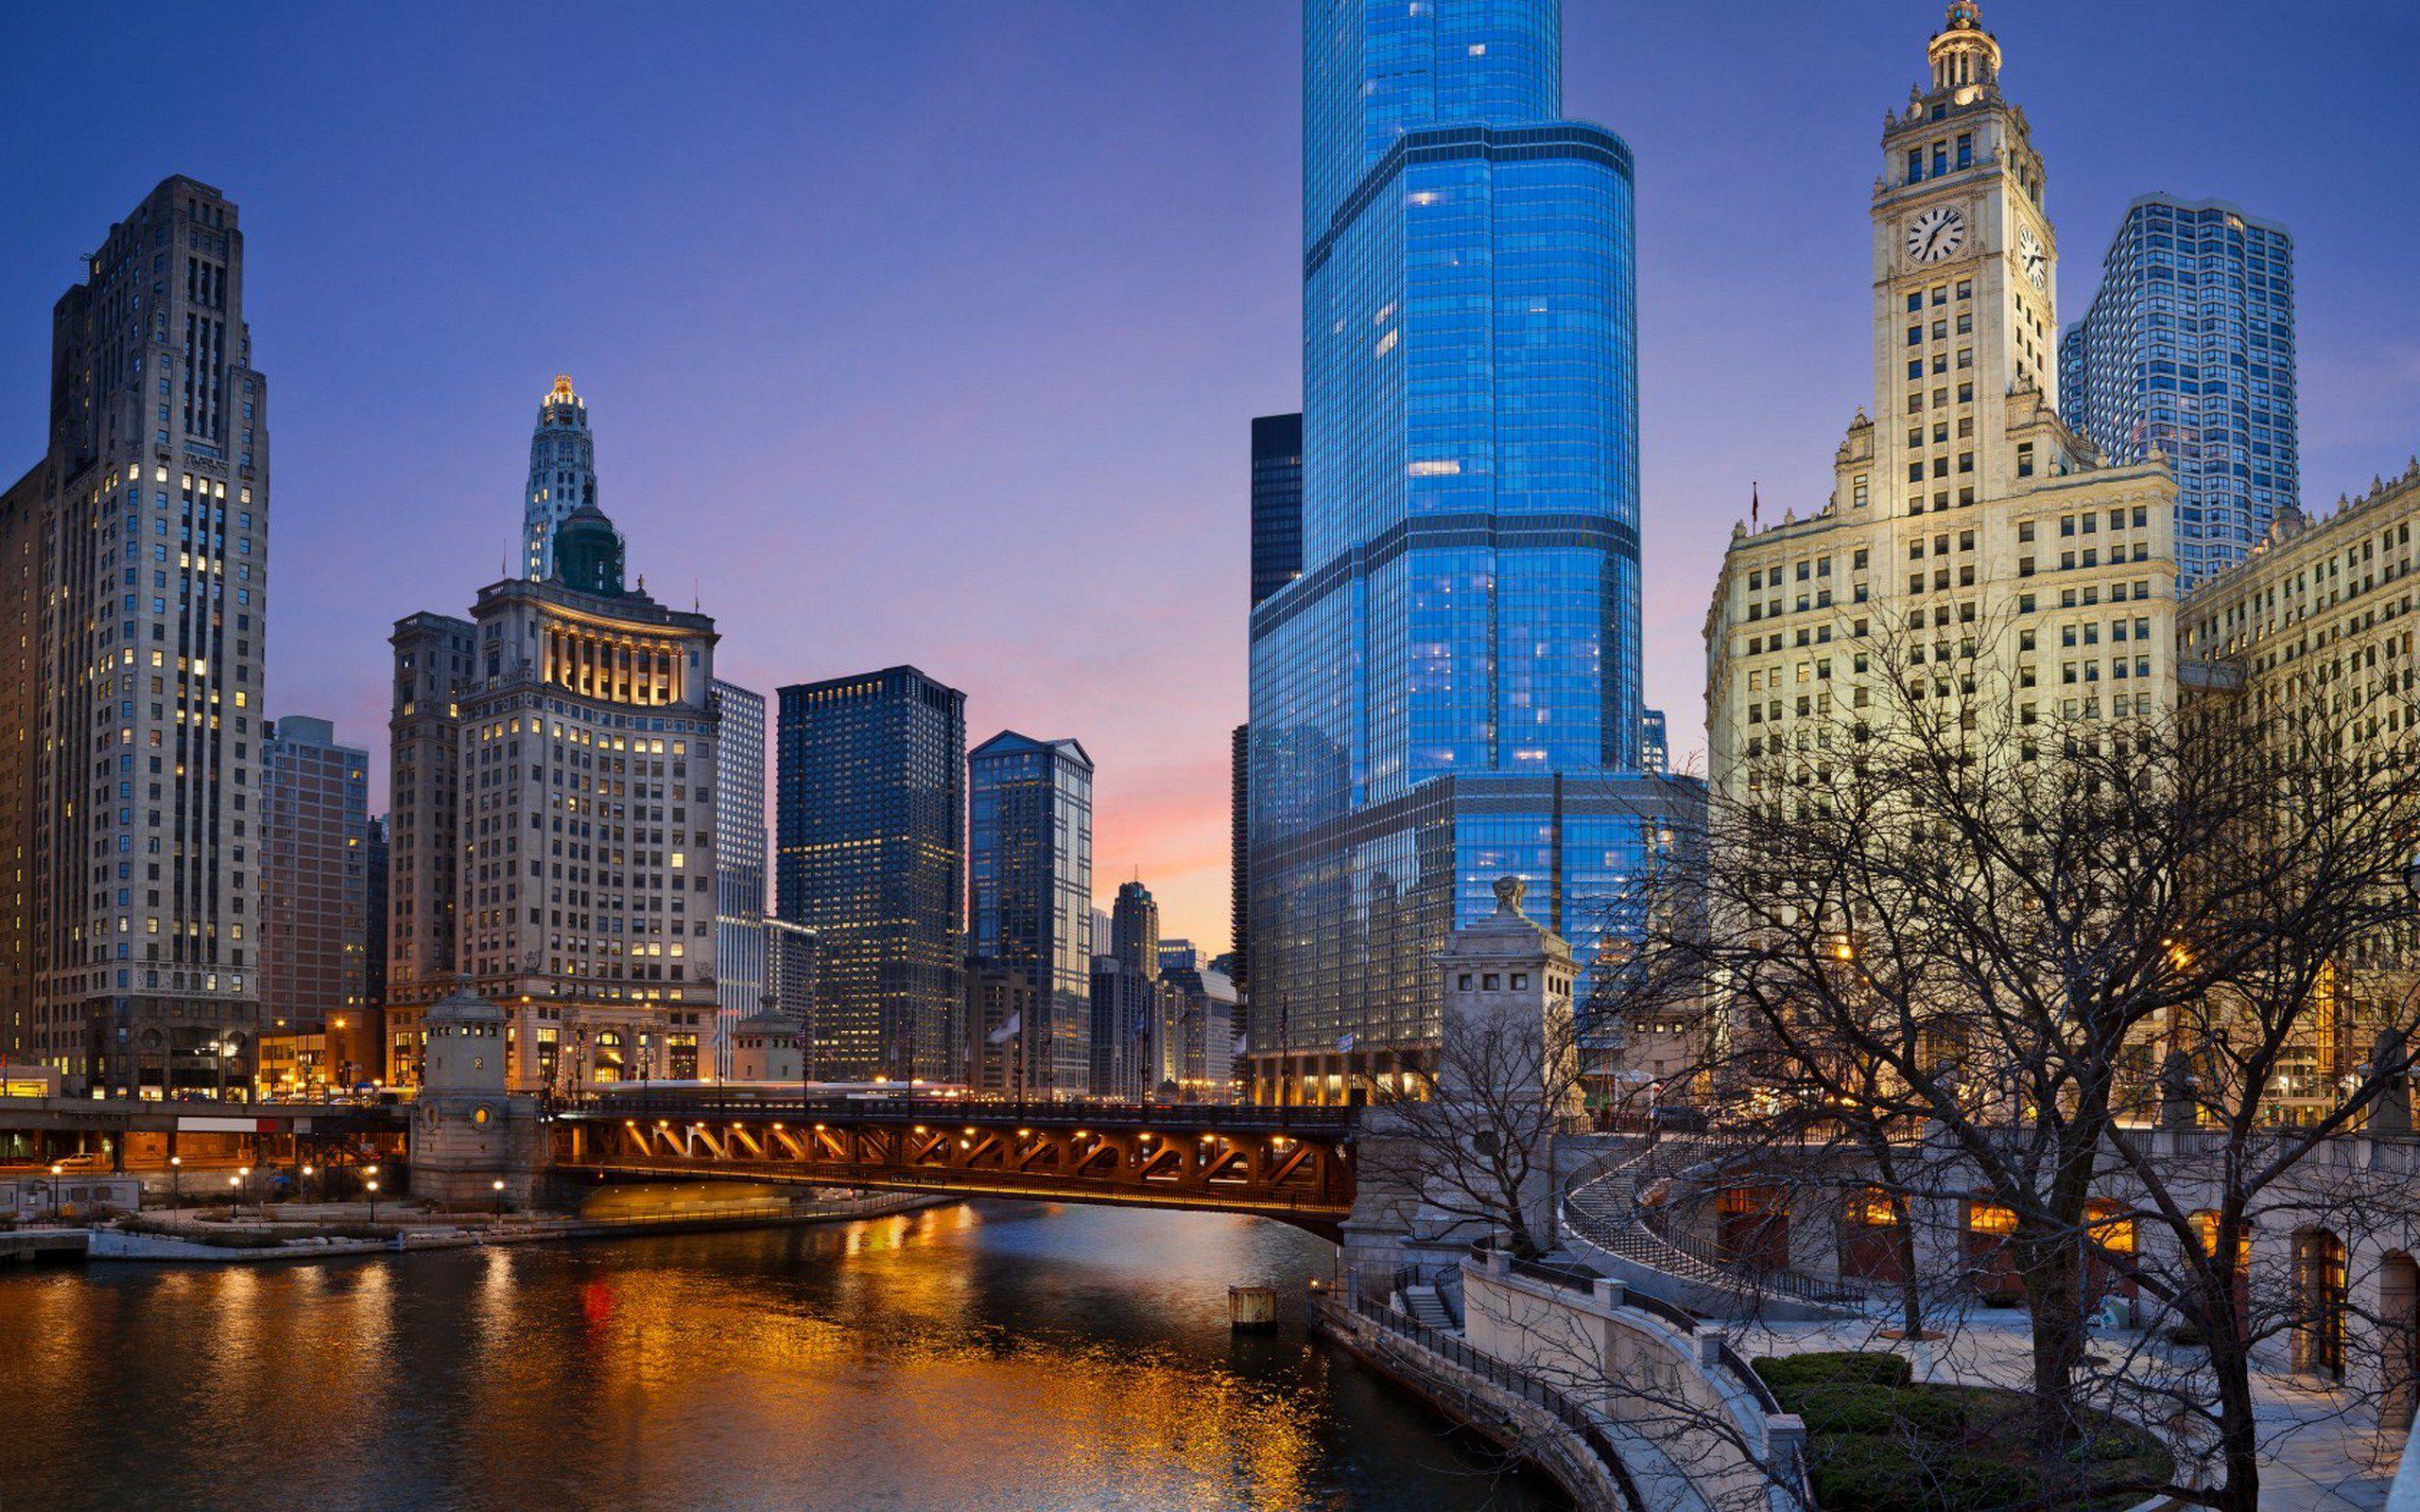 The Illinois state